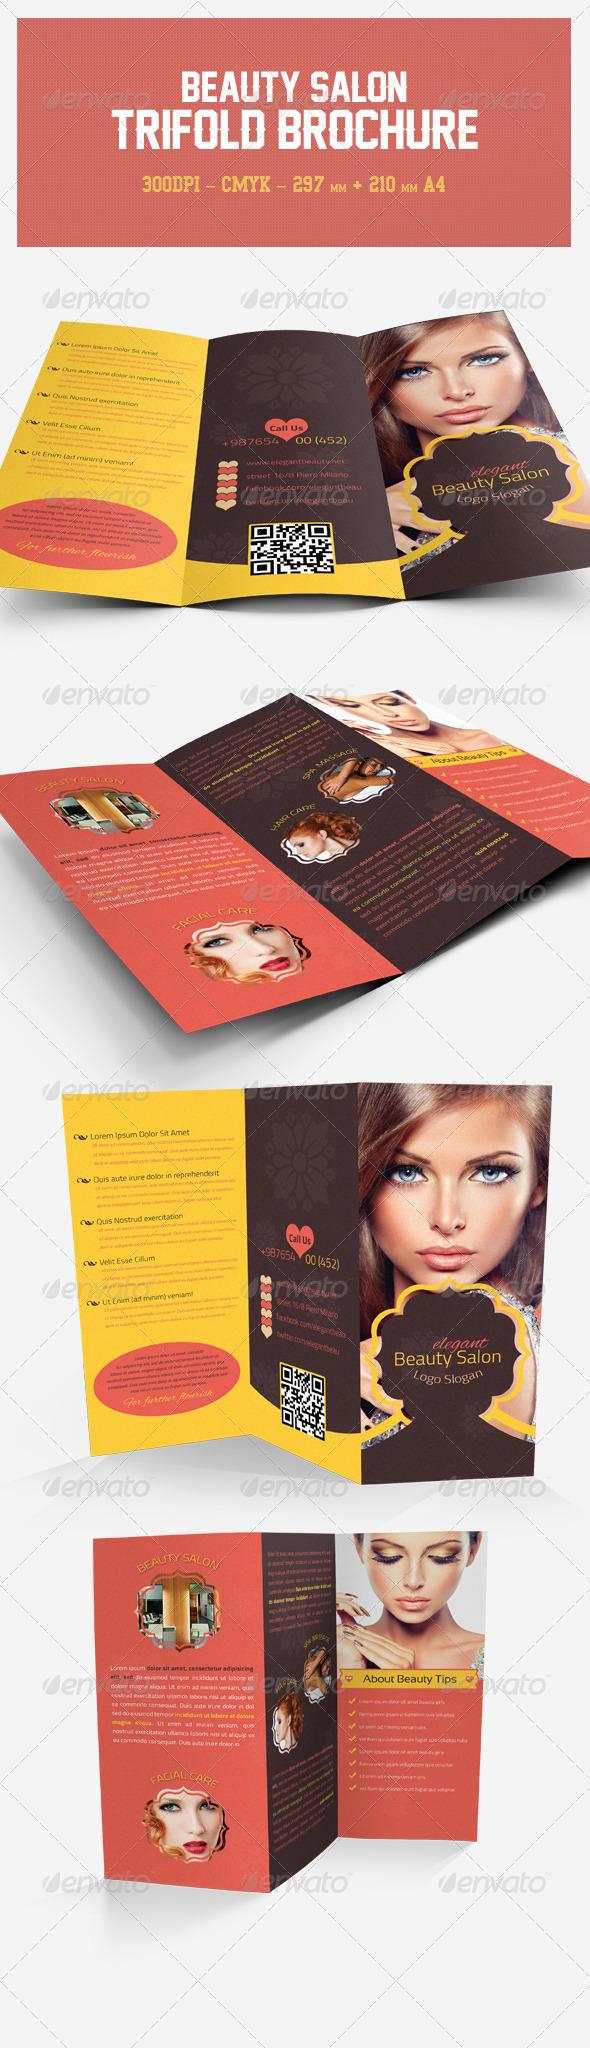 Elegant Beauty Salon Tri-fold Brochure | Pinterest